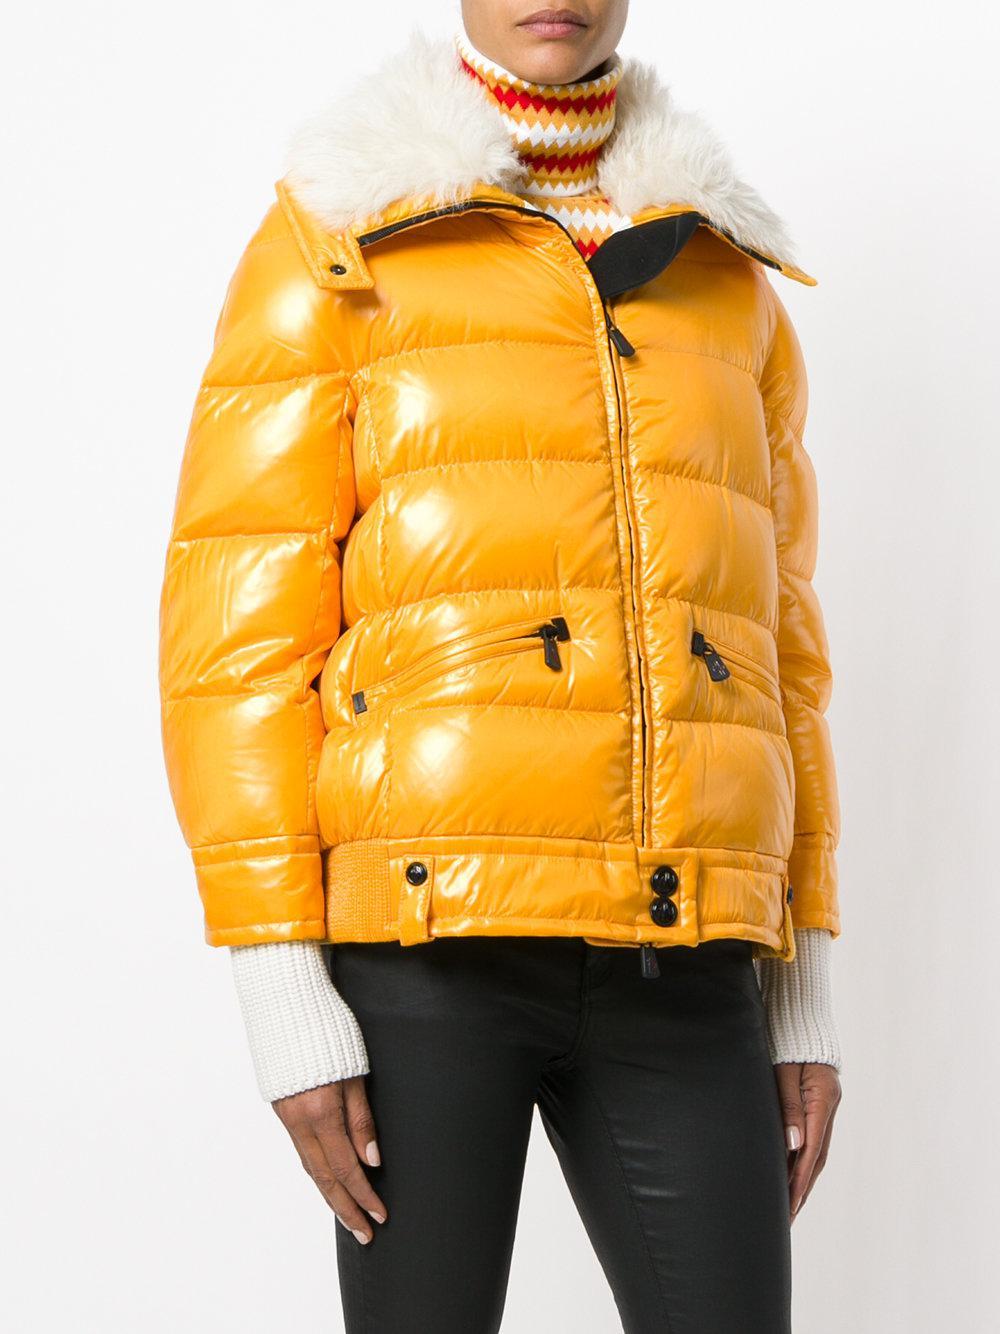 4dd4a48d9d5a Moncler Grenoble Lamb Fur Collar Puffer Jacket in Yellow - Lyst